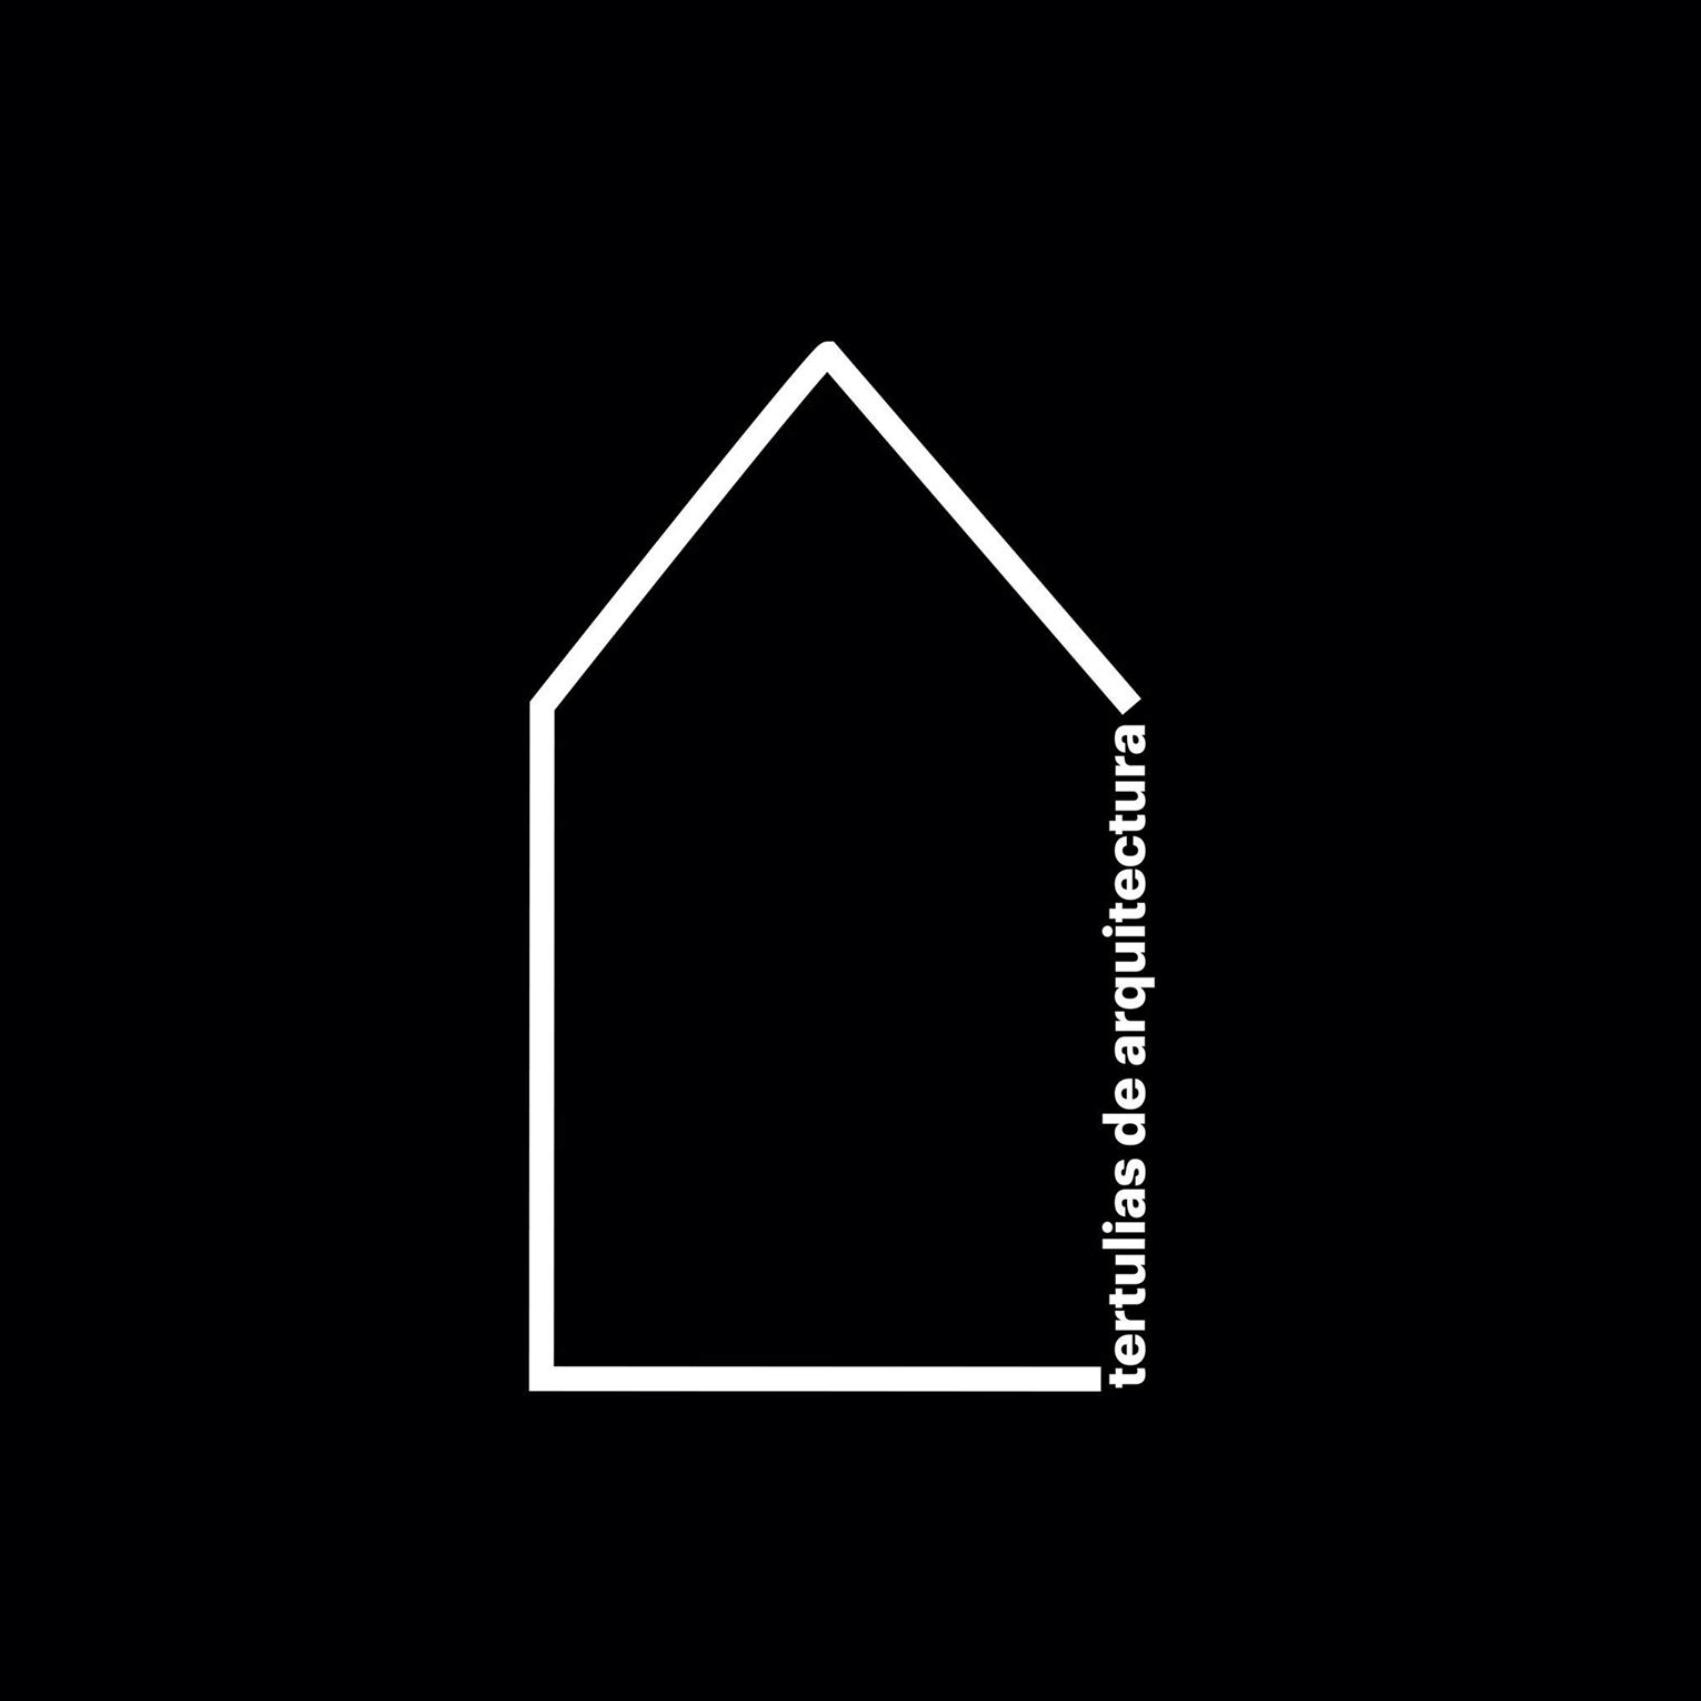 #desdecasa por architecturalaffairs